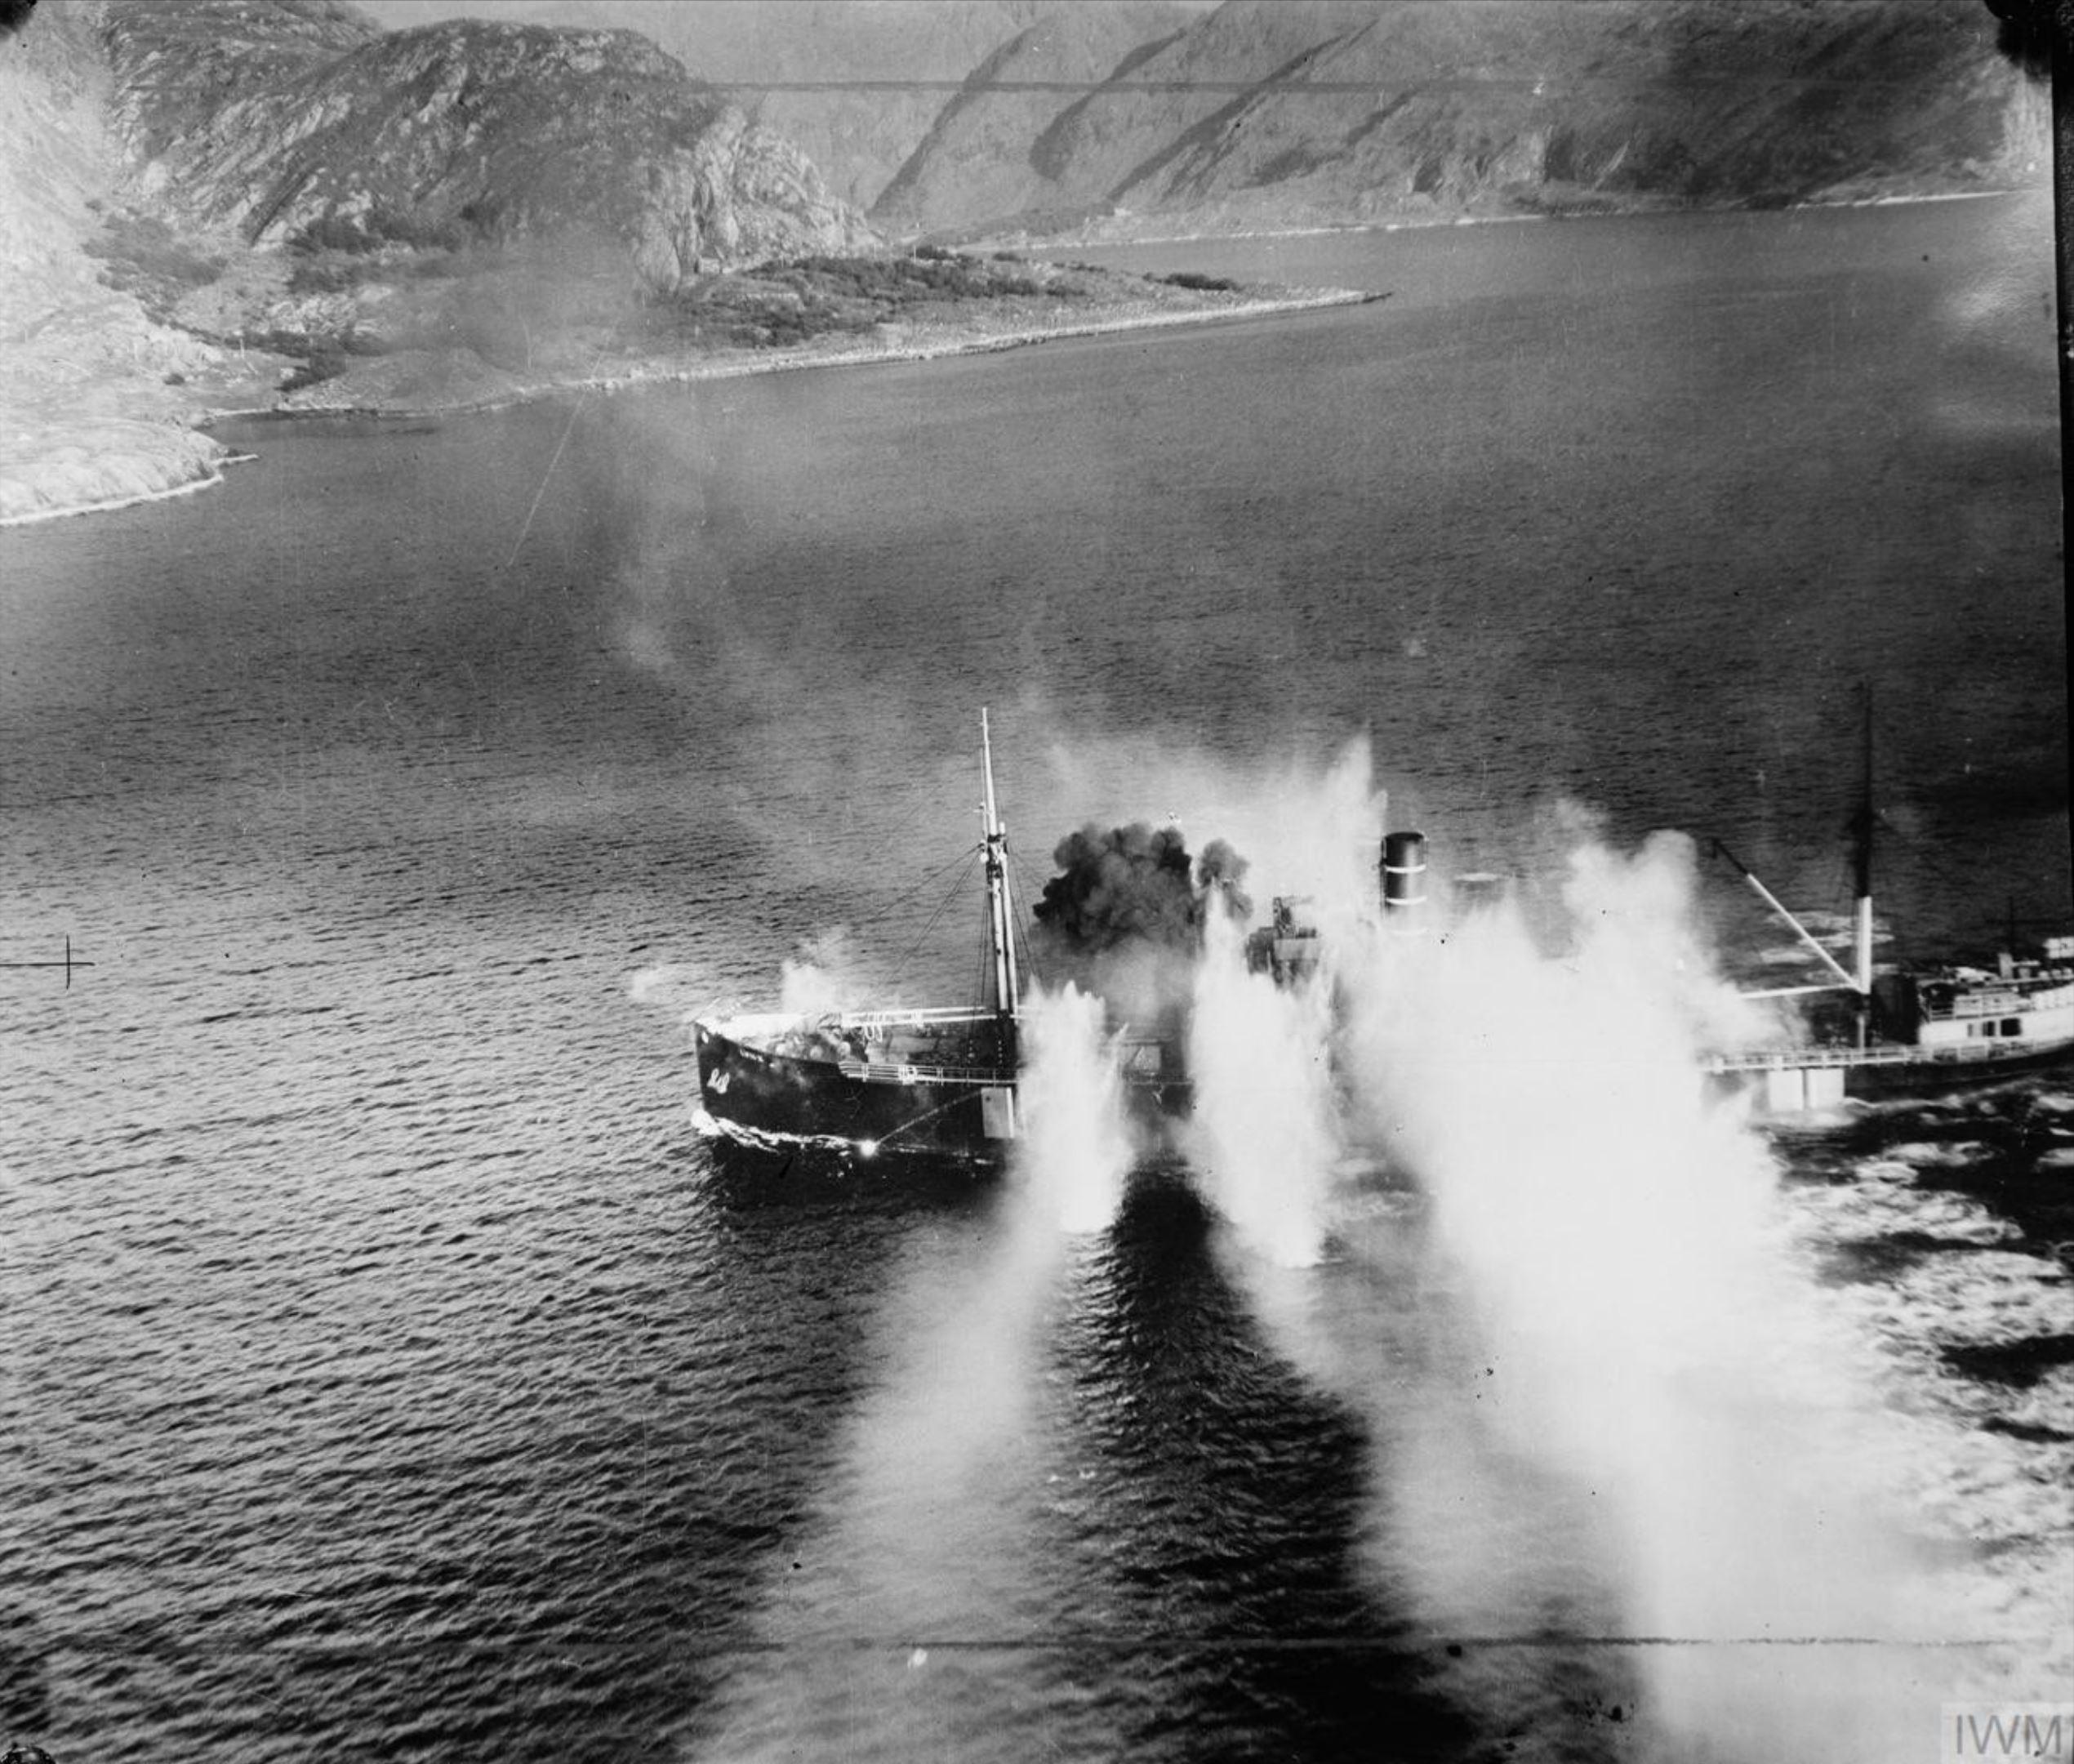 Beaufighter Banff Strike Wing sink 1,367 ton merchant vessel LYNX in Stav Fjord Norway 19 Sep 1944 IWM C4657